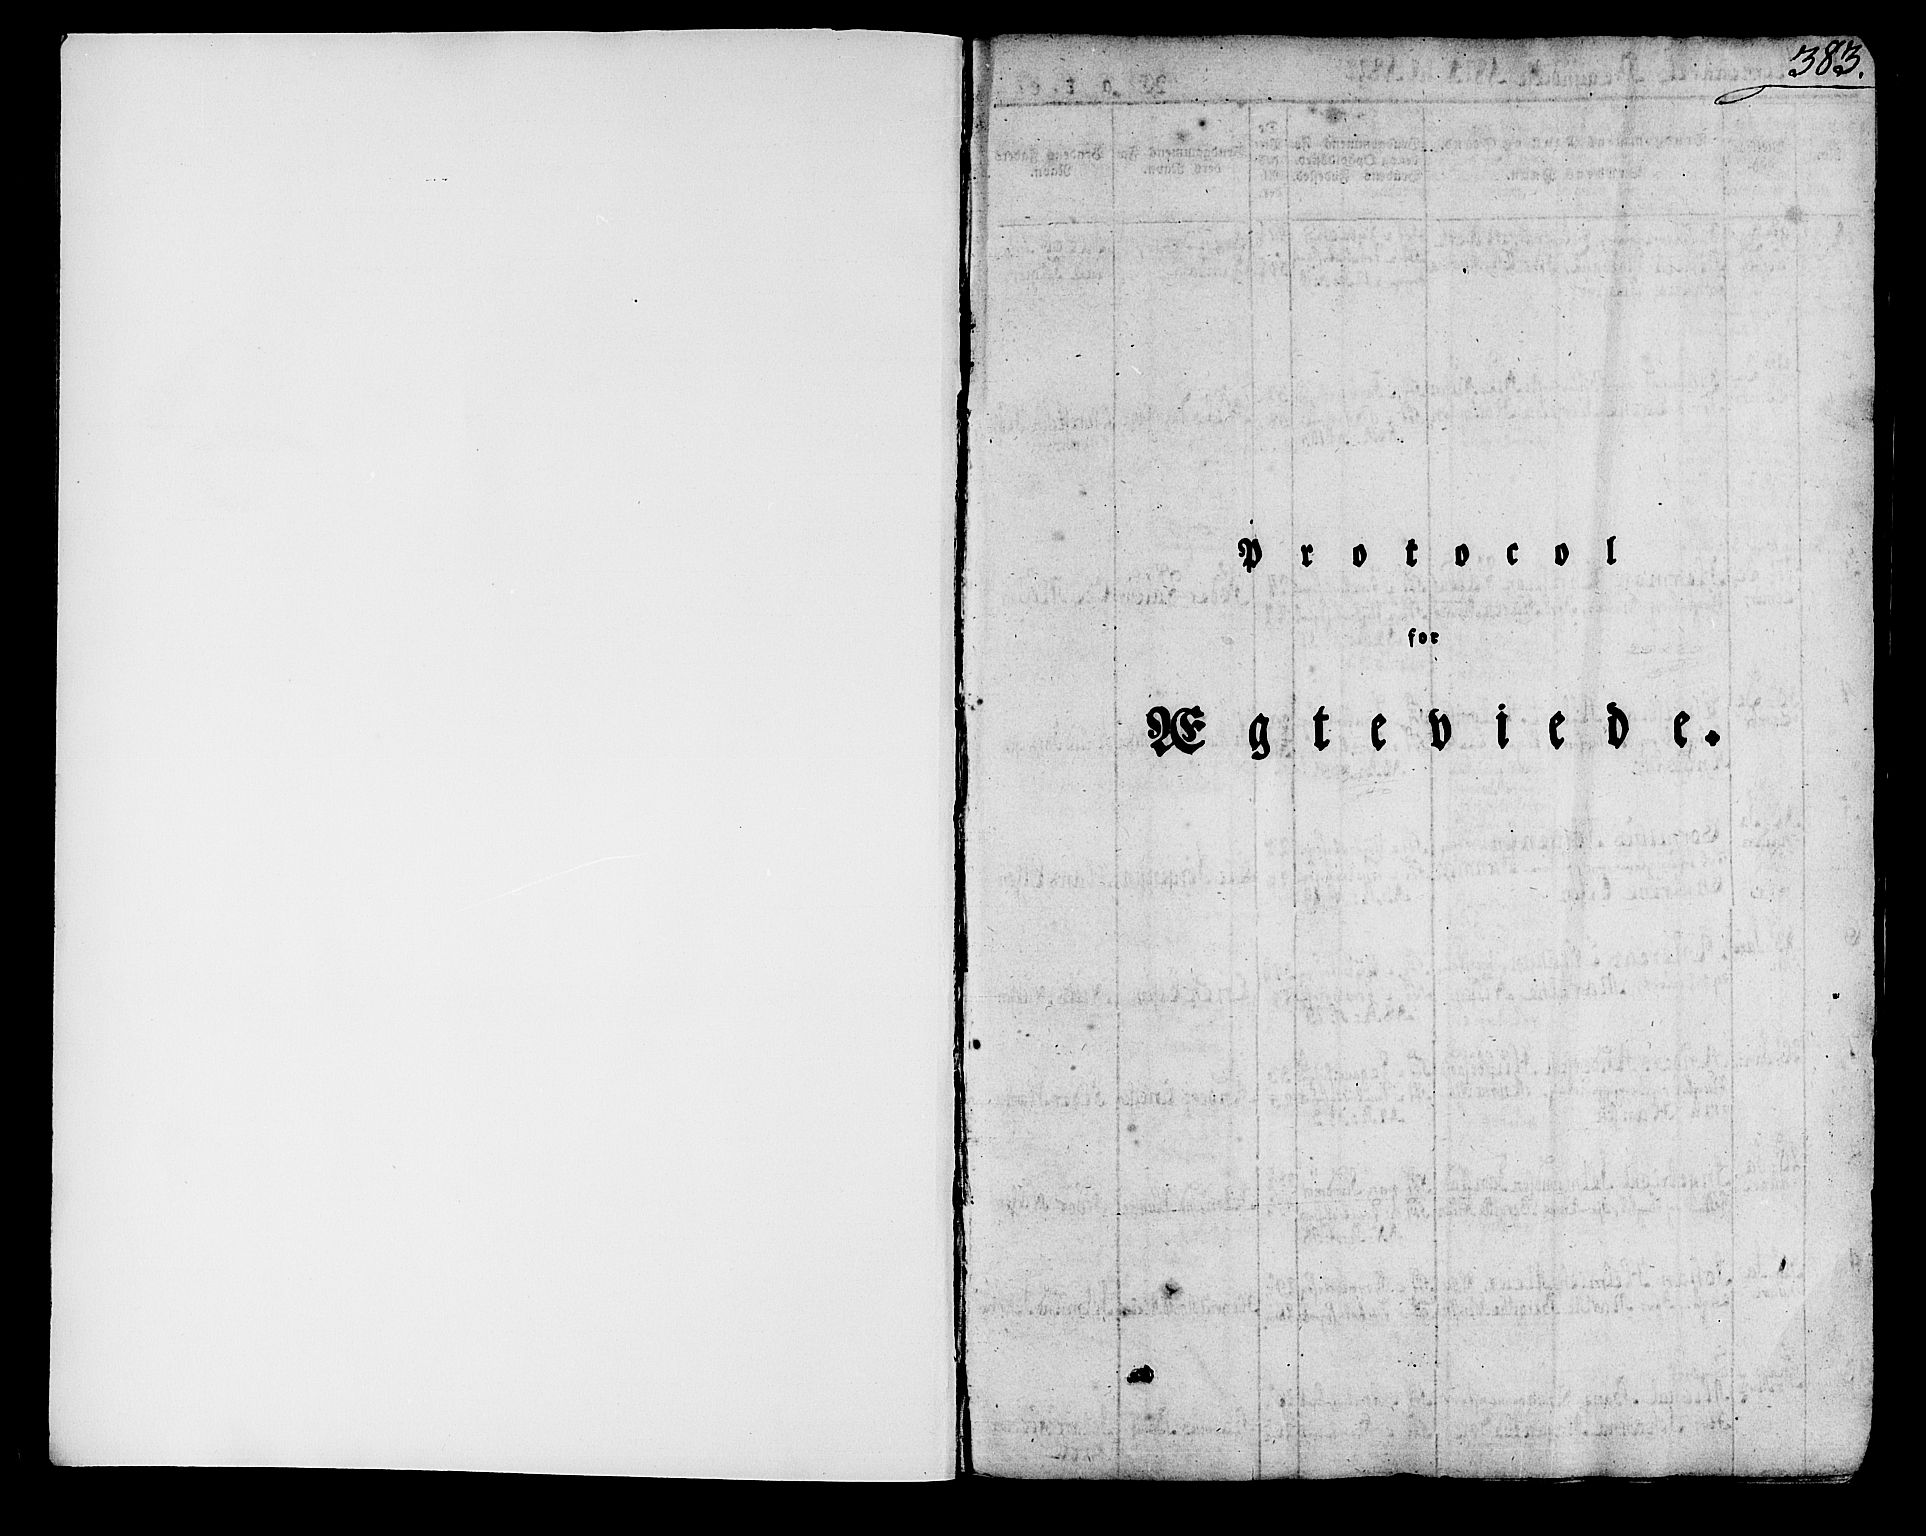 SAB, Domkirken sokneprestembete, H/Haa/L0012: Ministerialbok nr. A 12, 1821-1840, s. 383